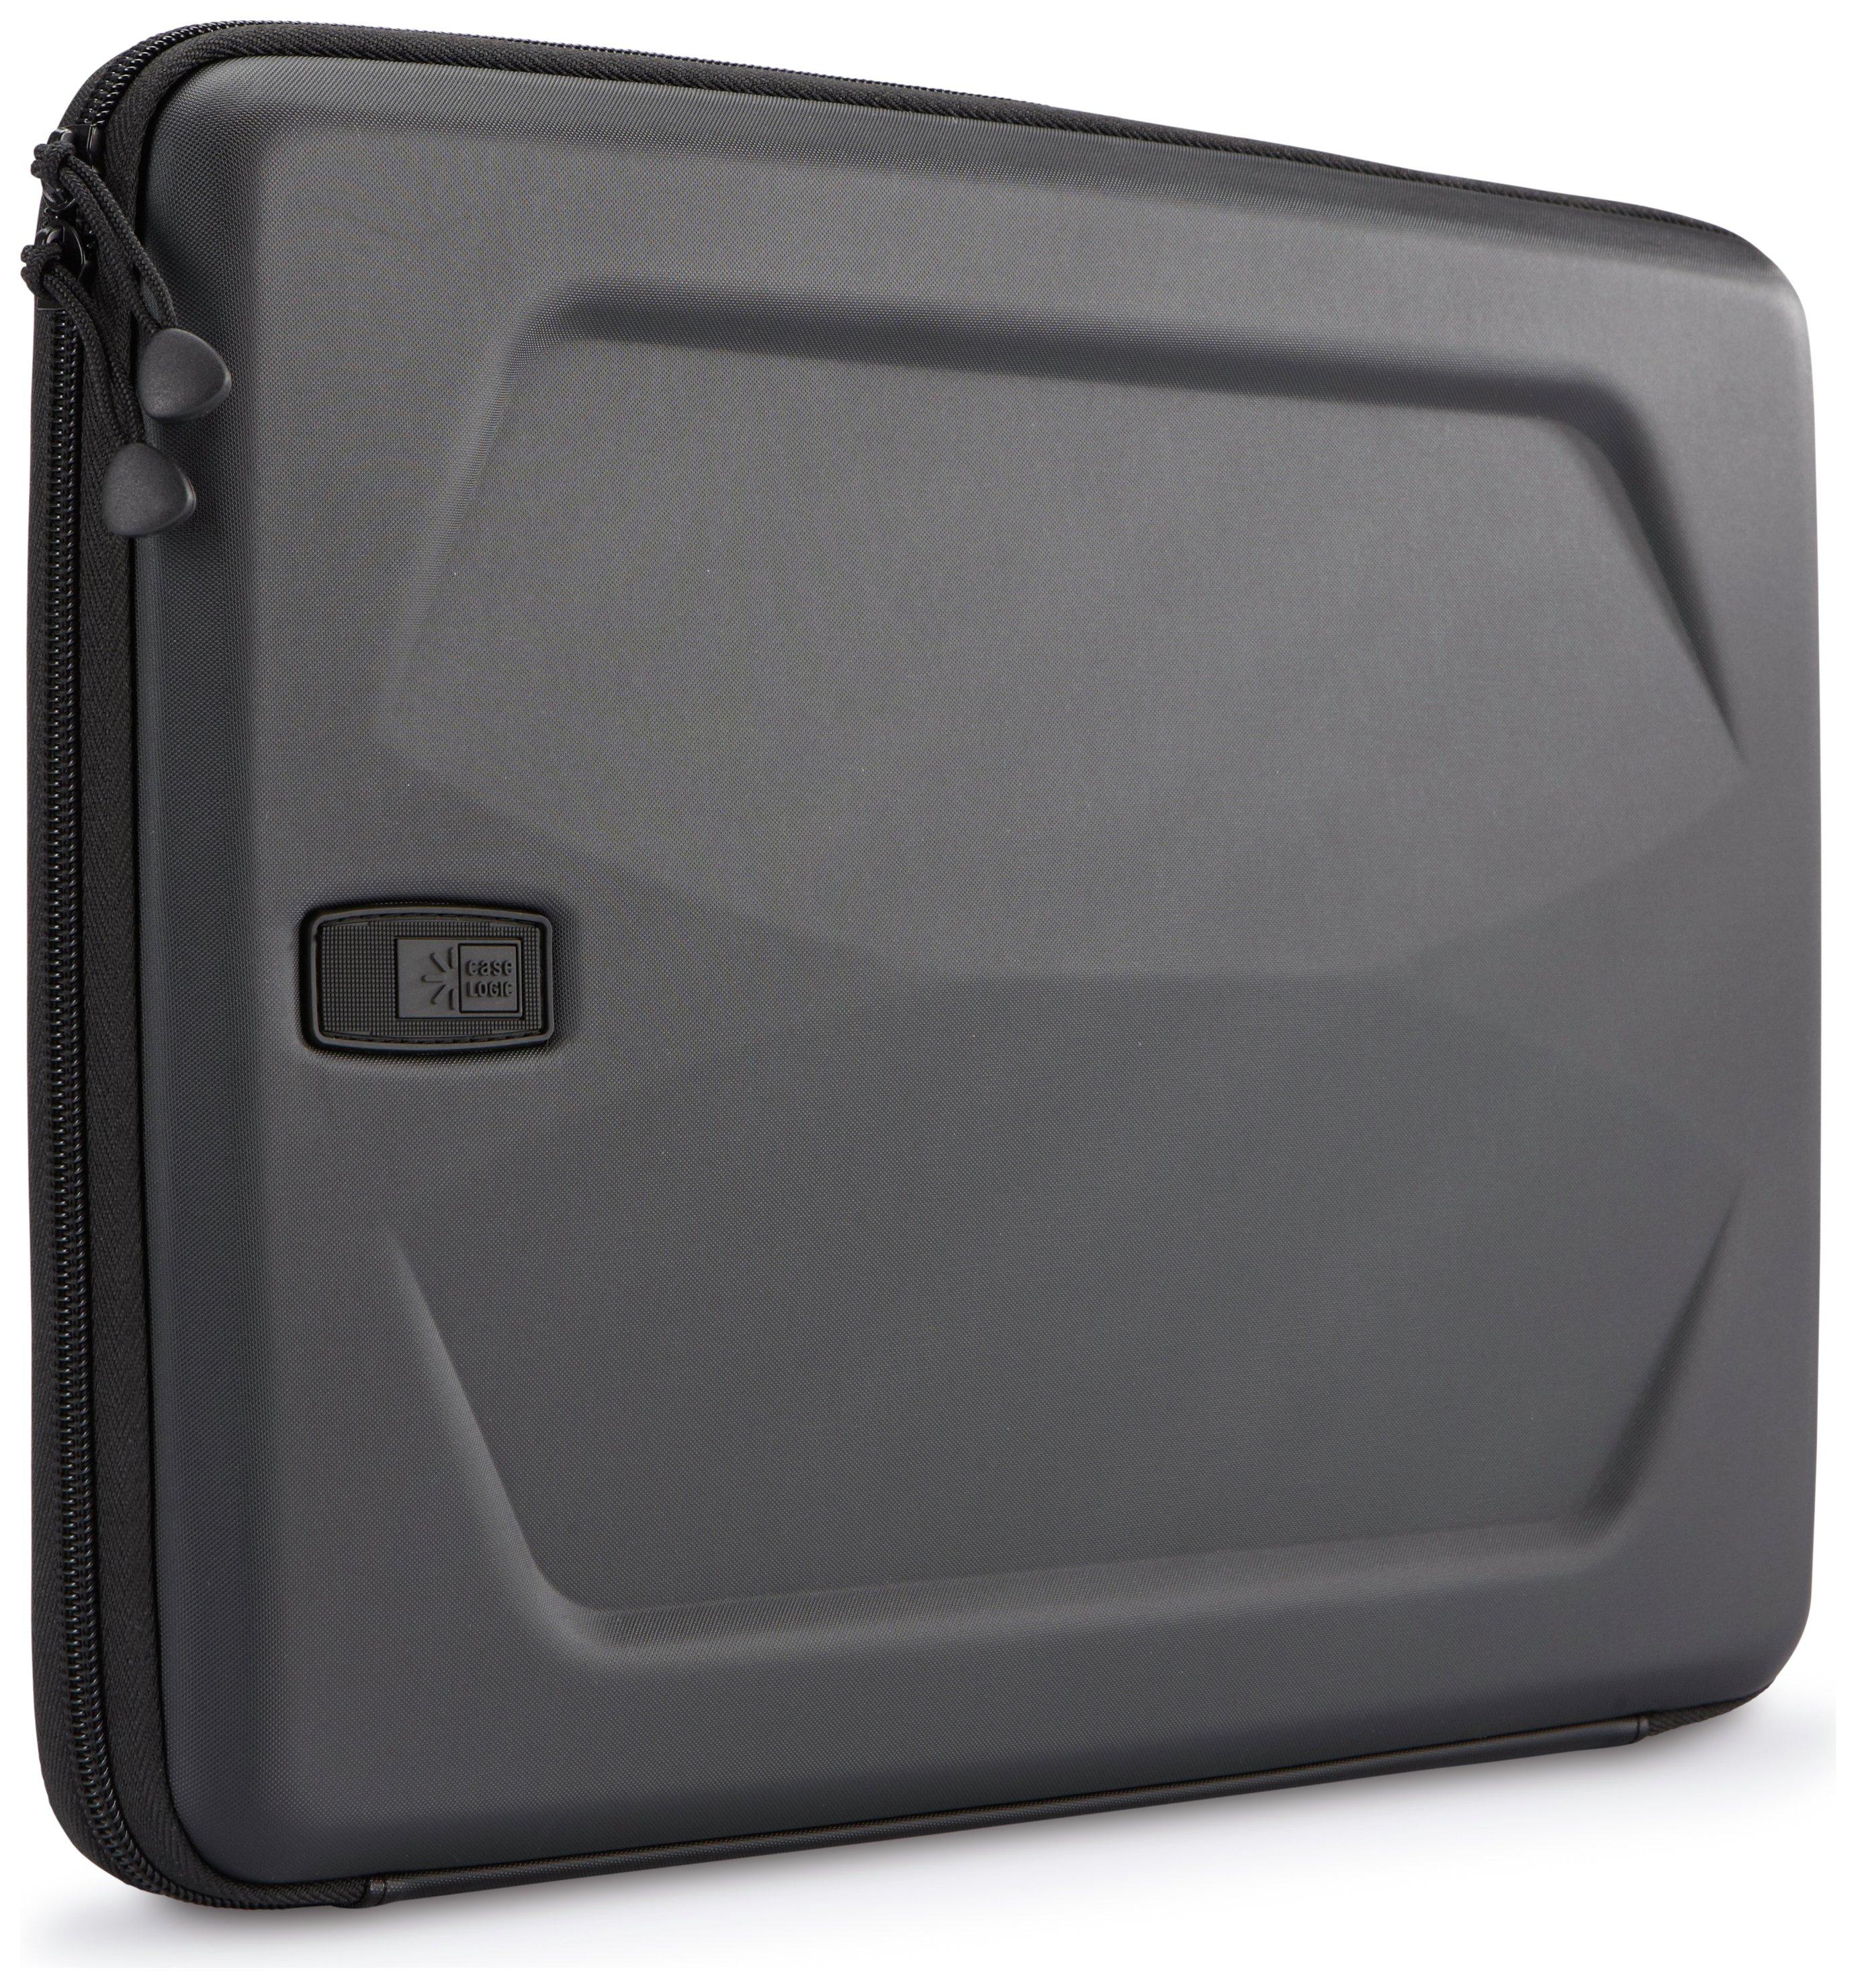 Image of Case Logic 15.6 inch Hardshell Sleeve for Laptops - Black.